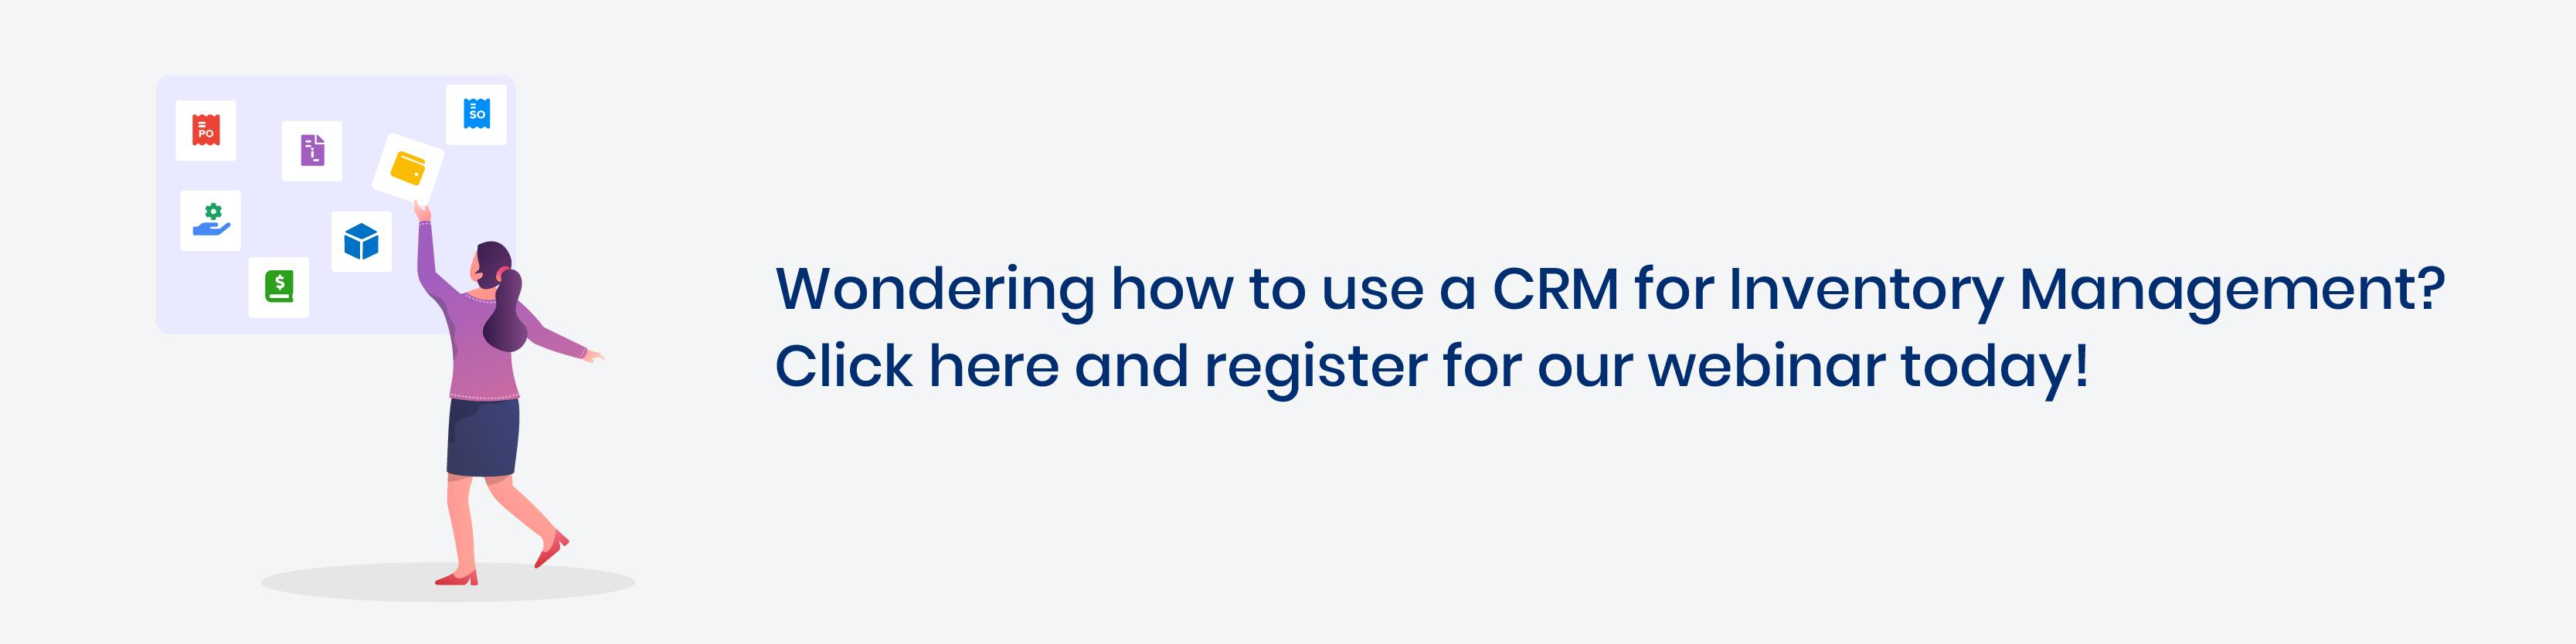 webinar registration link